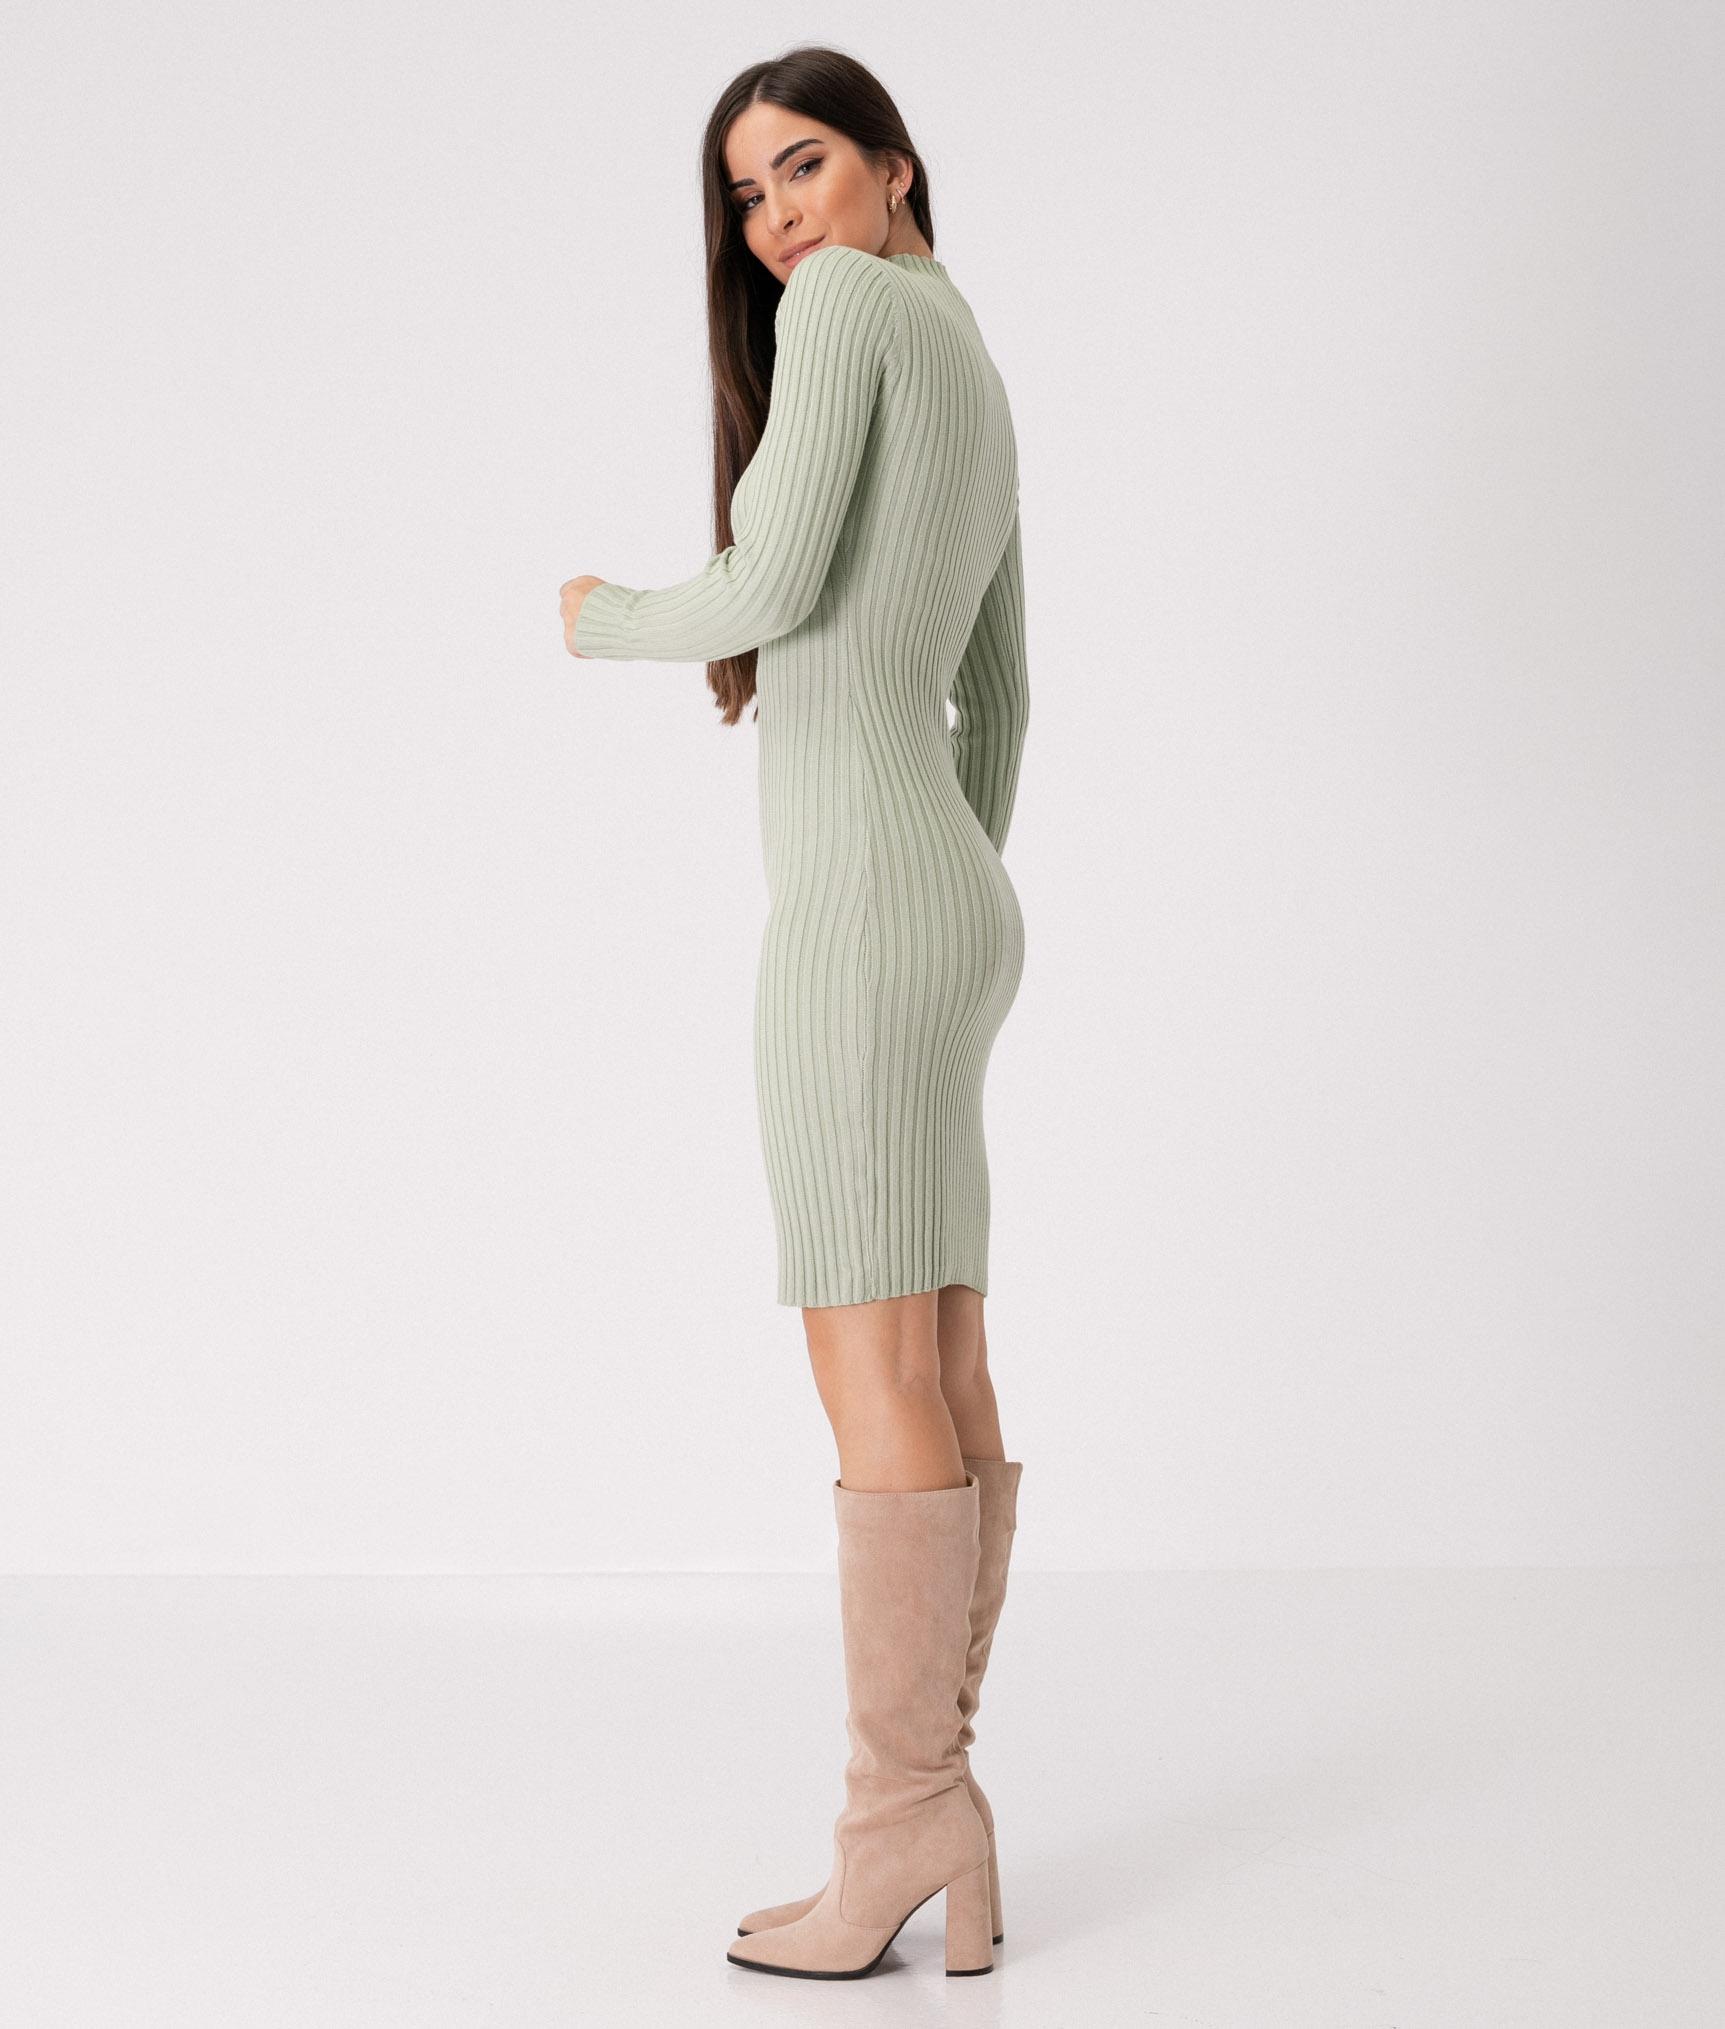 YUNCALE DRESS - GREEN